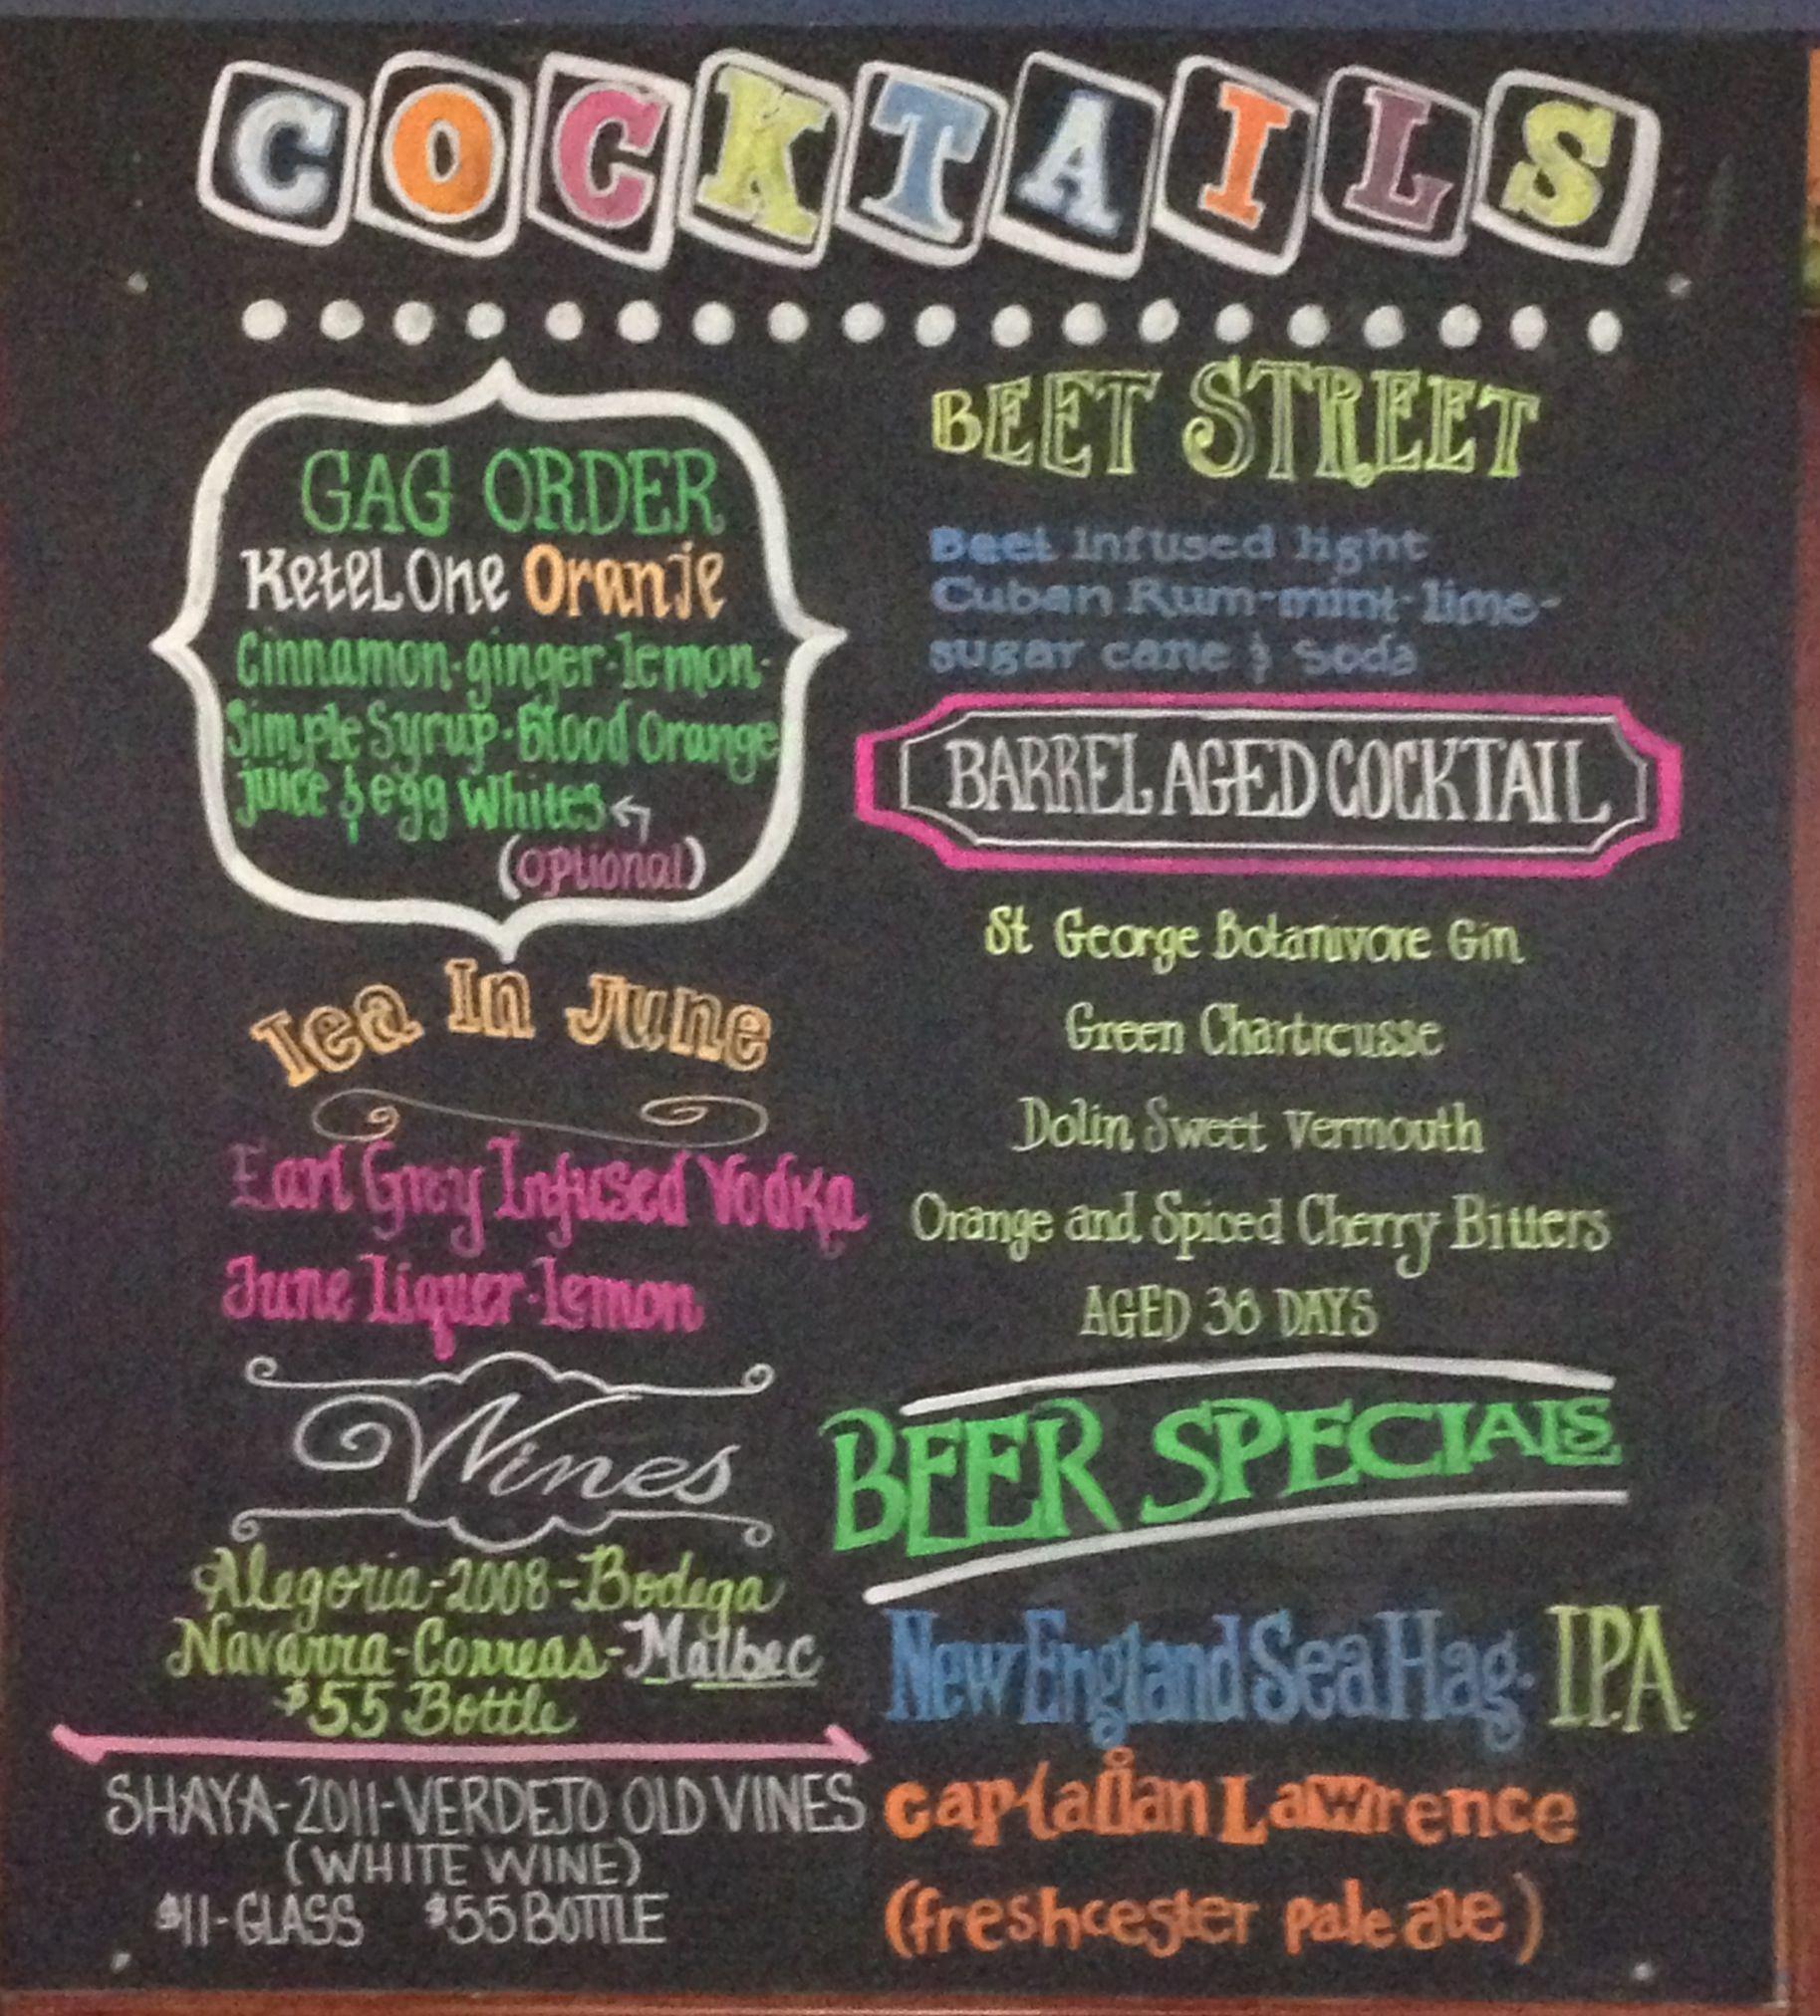 valencia chalkboard art cocktails